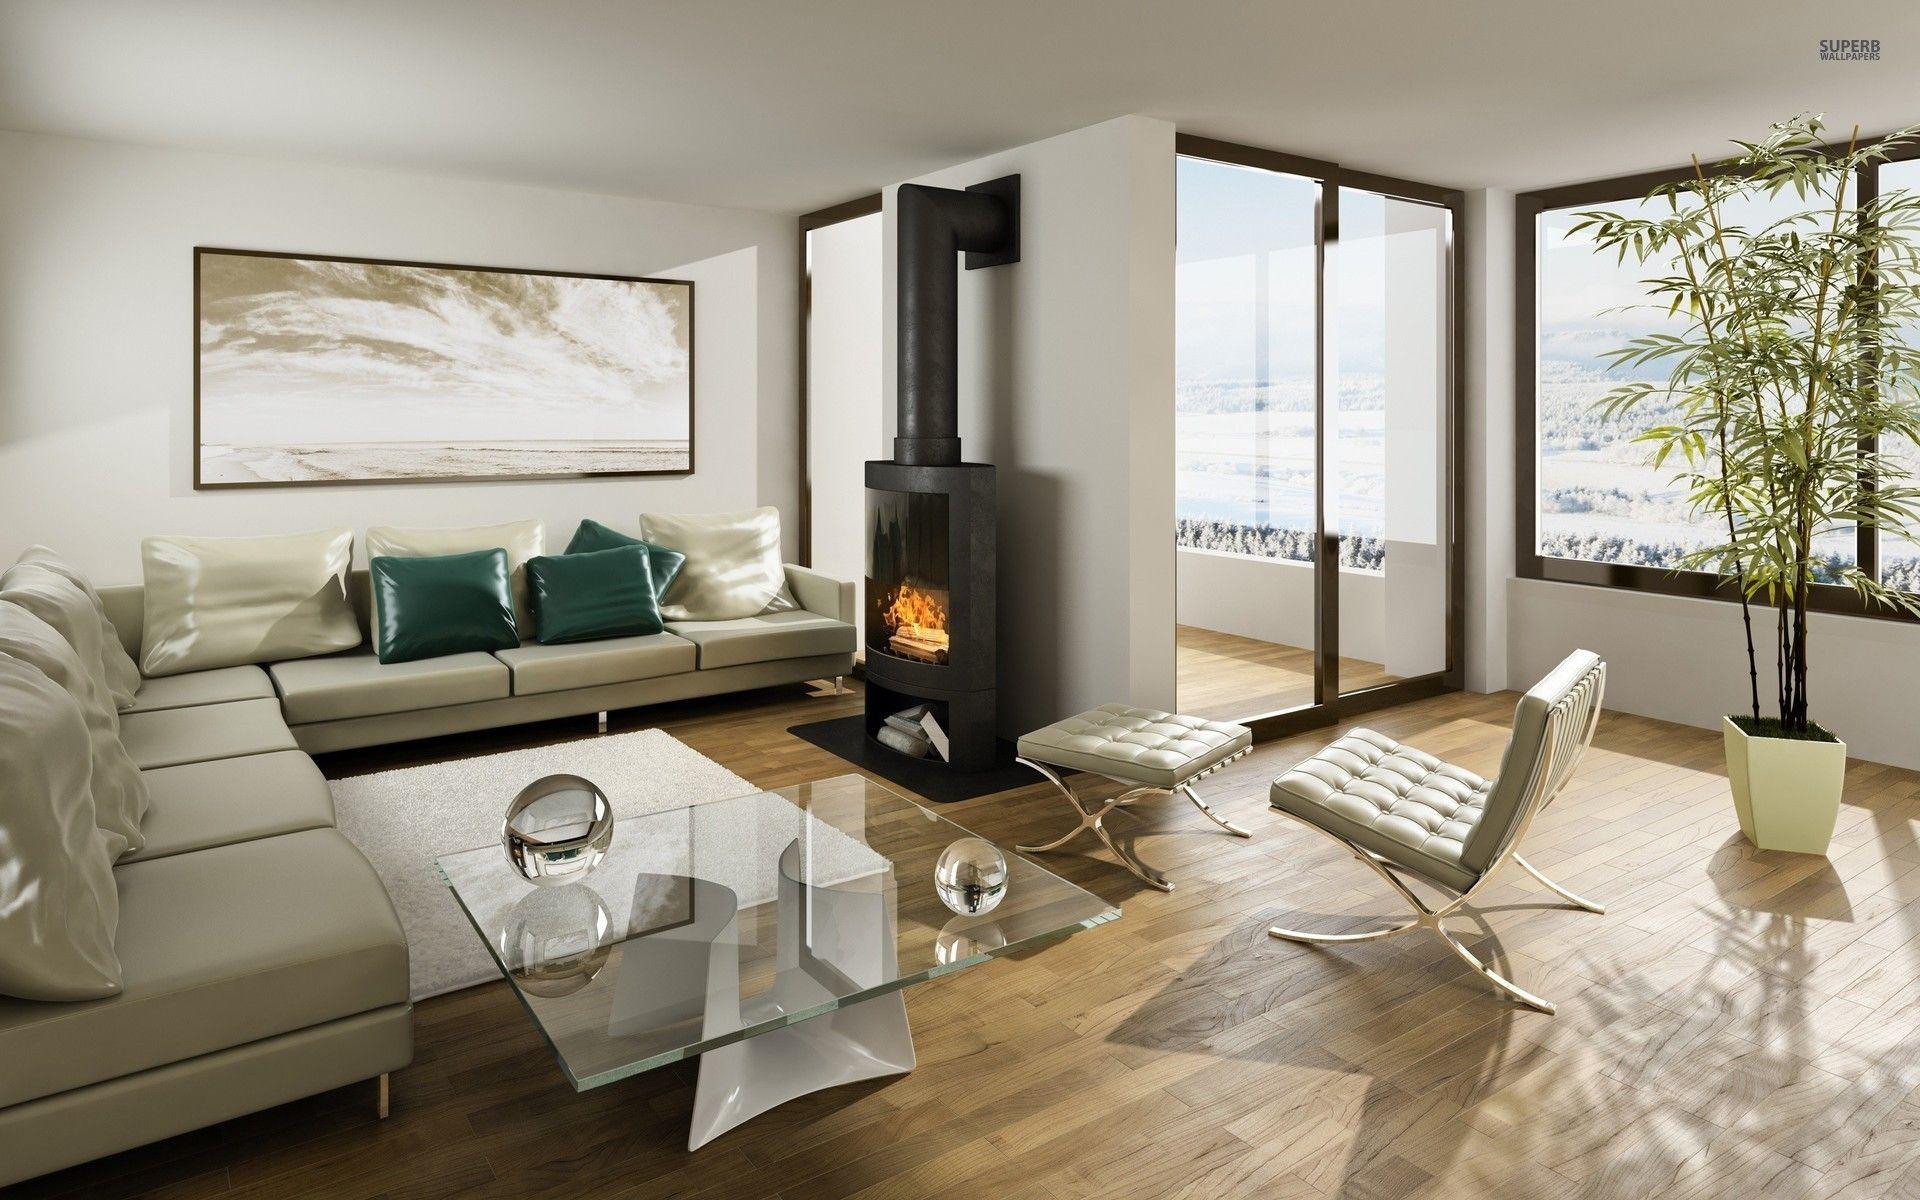 A Living Room Design Glamorous Simplistic Living Room Design Wallpaper  Interior Design Design Ideas